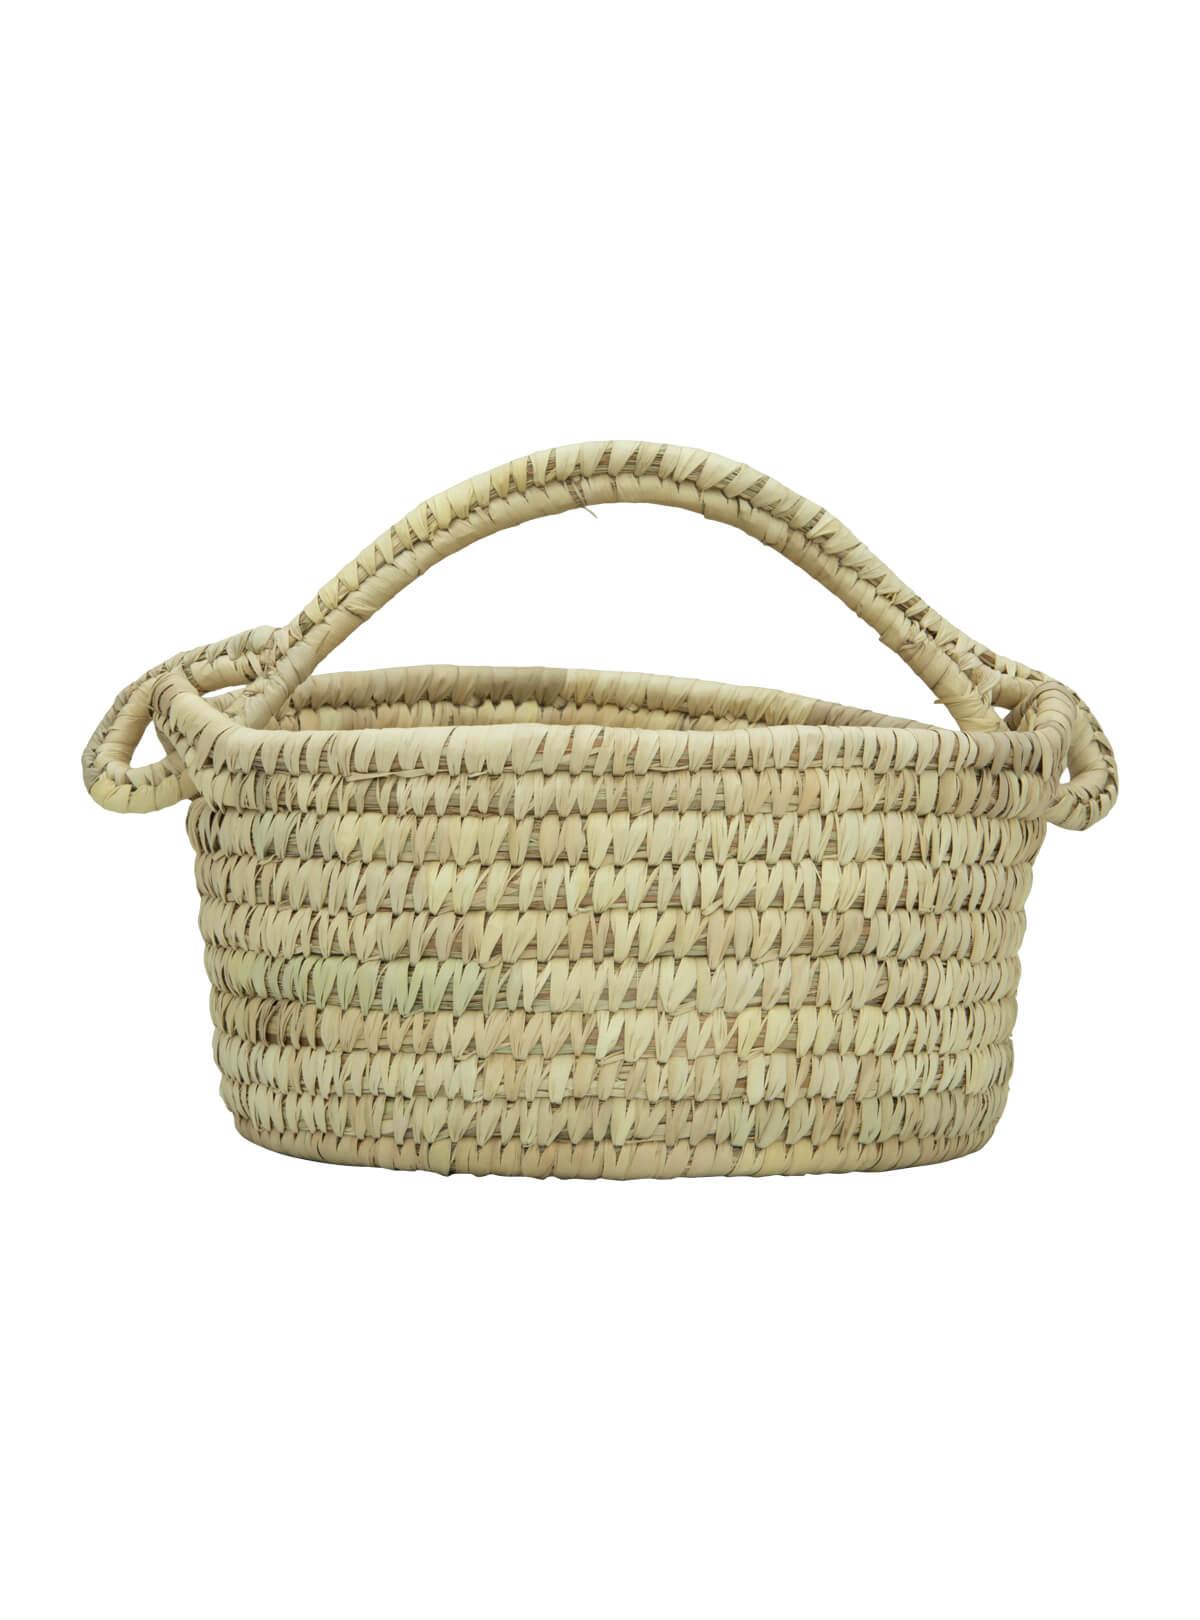 Kans Grass & Date leaf Woven Eco-Friendly Flower Basket